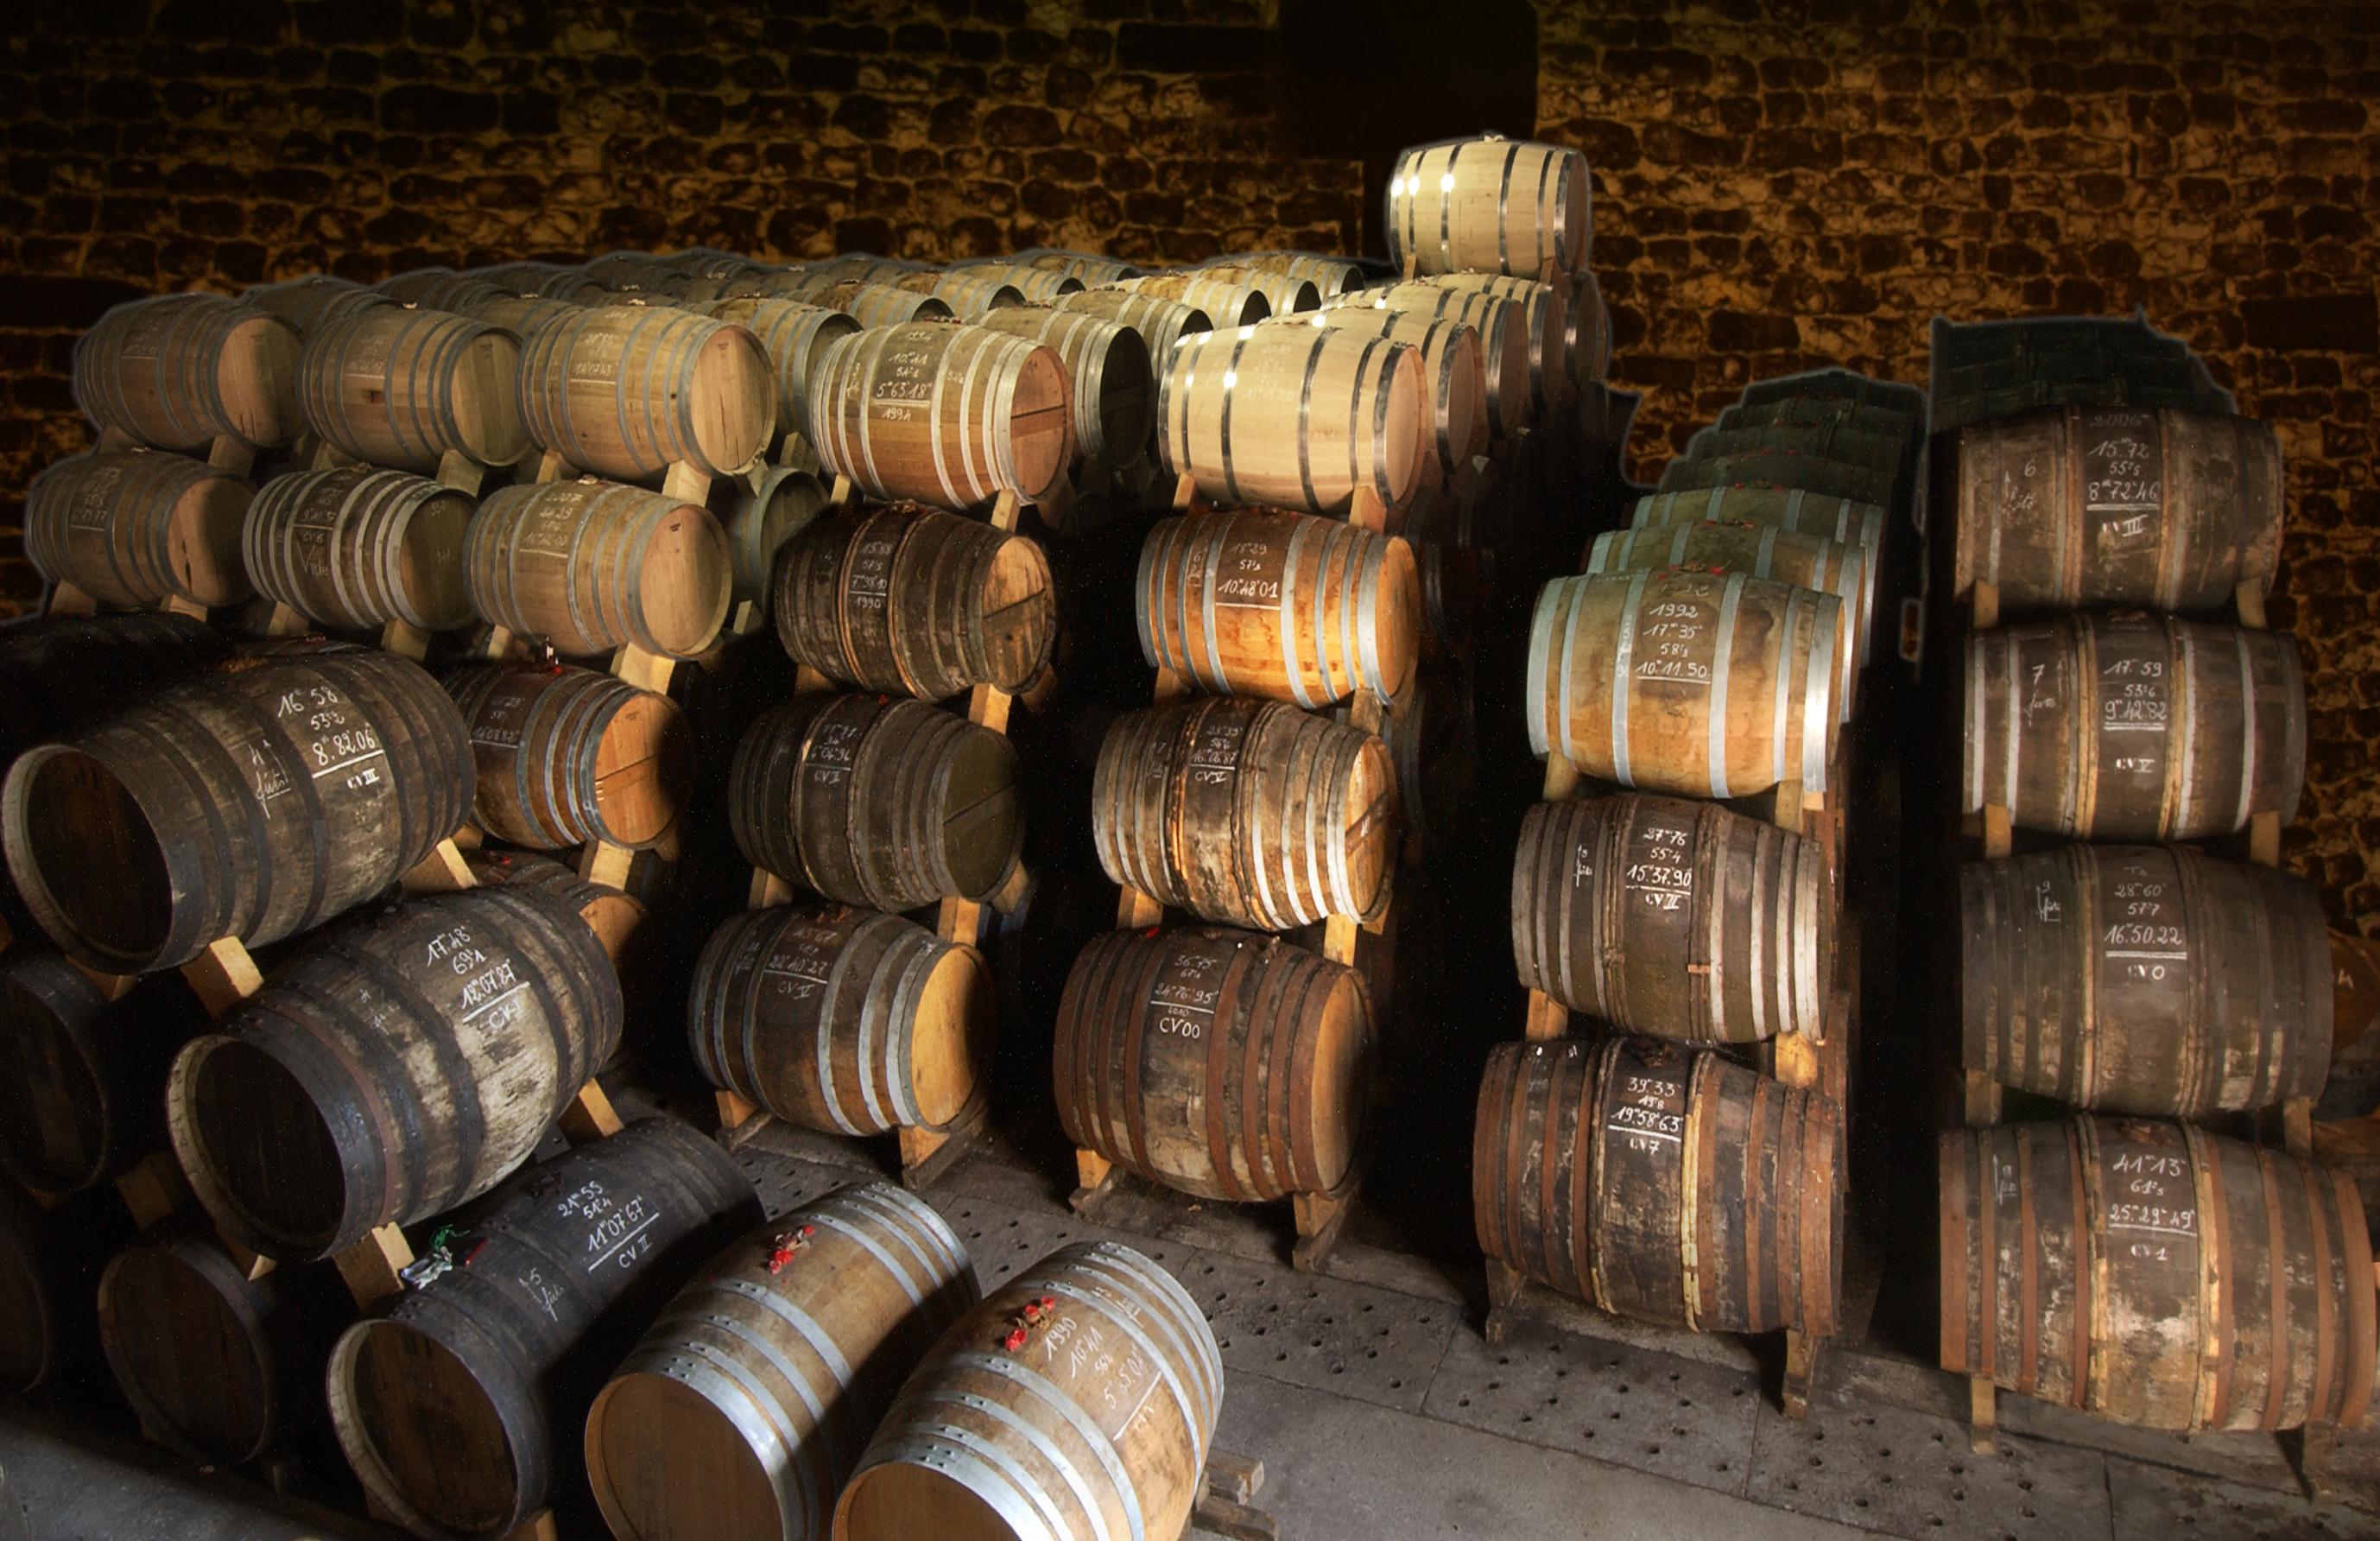 Courvoisier cellars